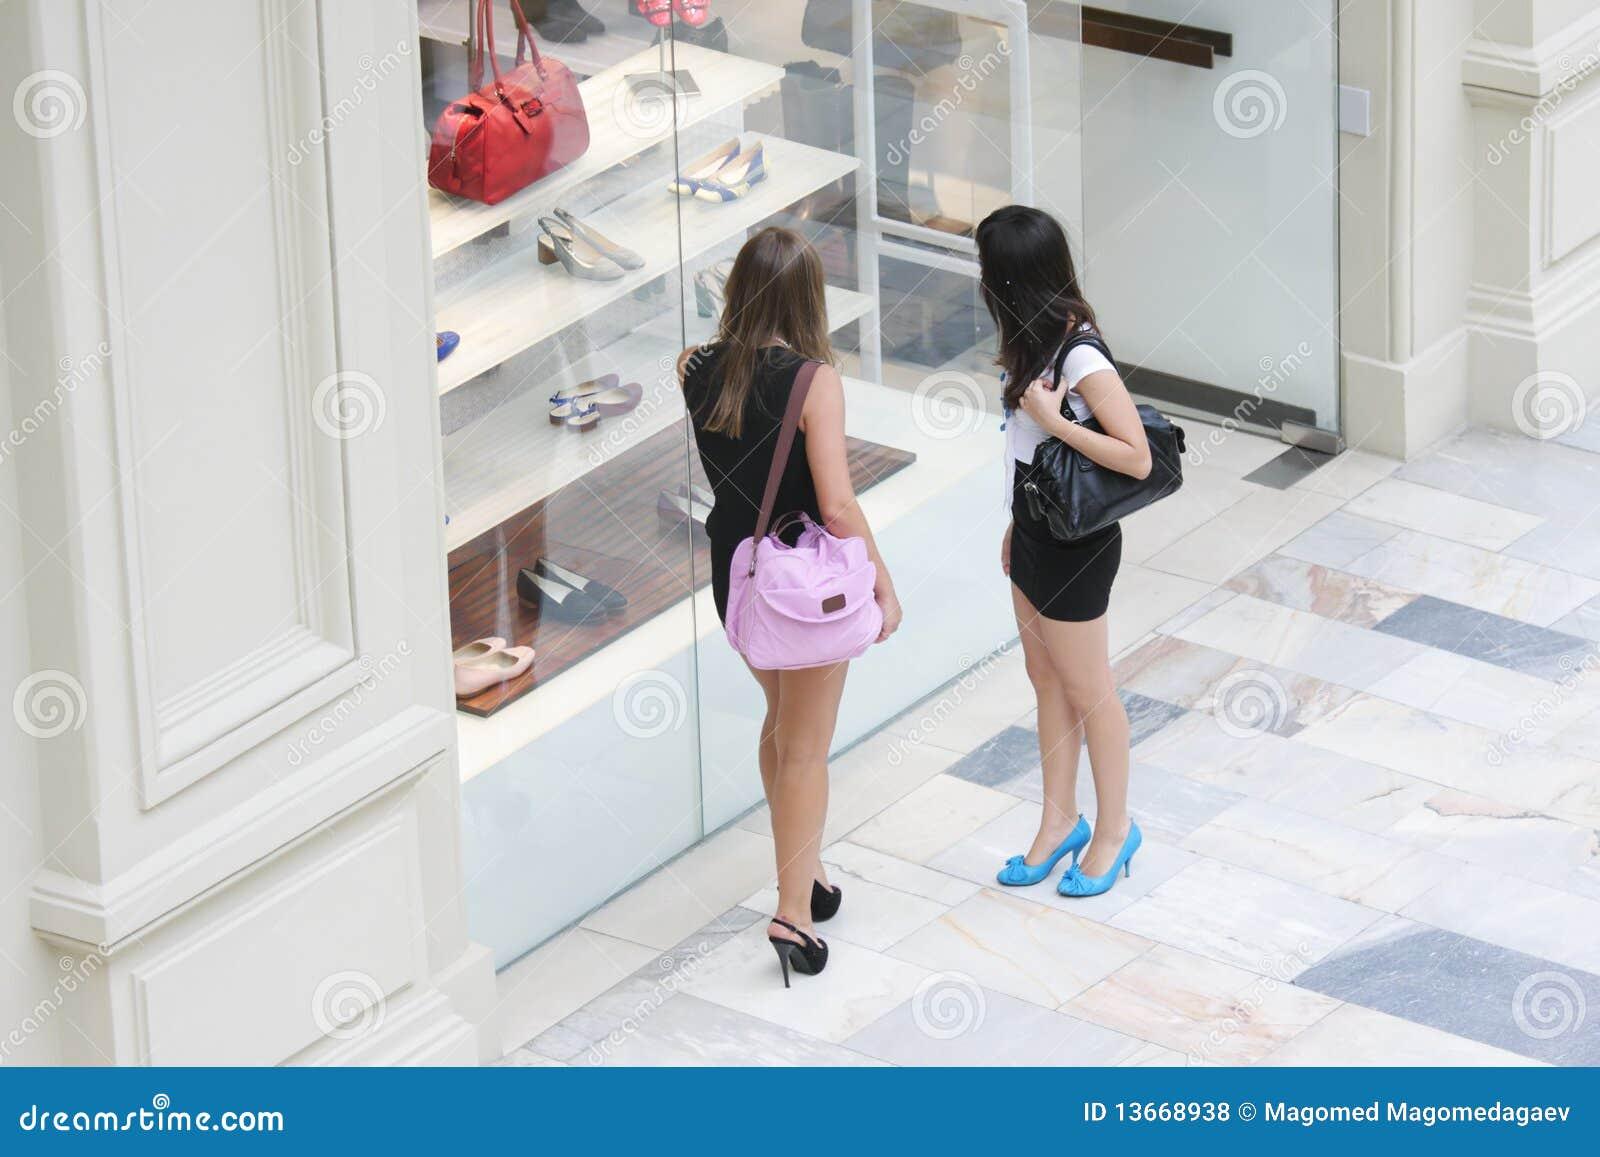 Royalty Free Stock Photos: Women at shoe shop window